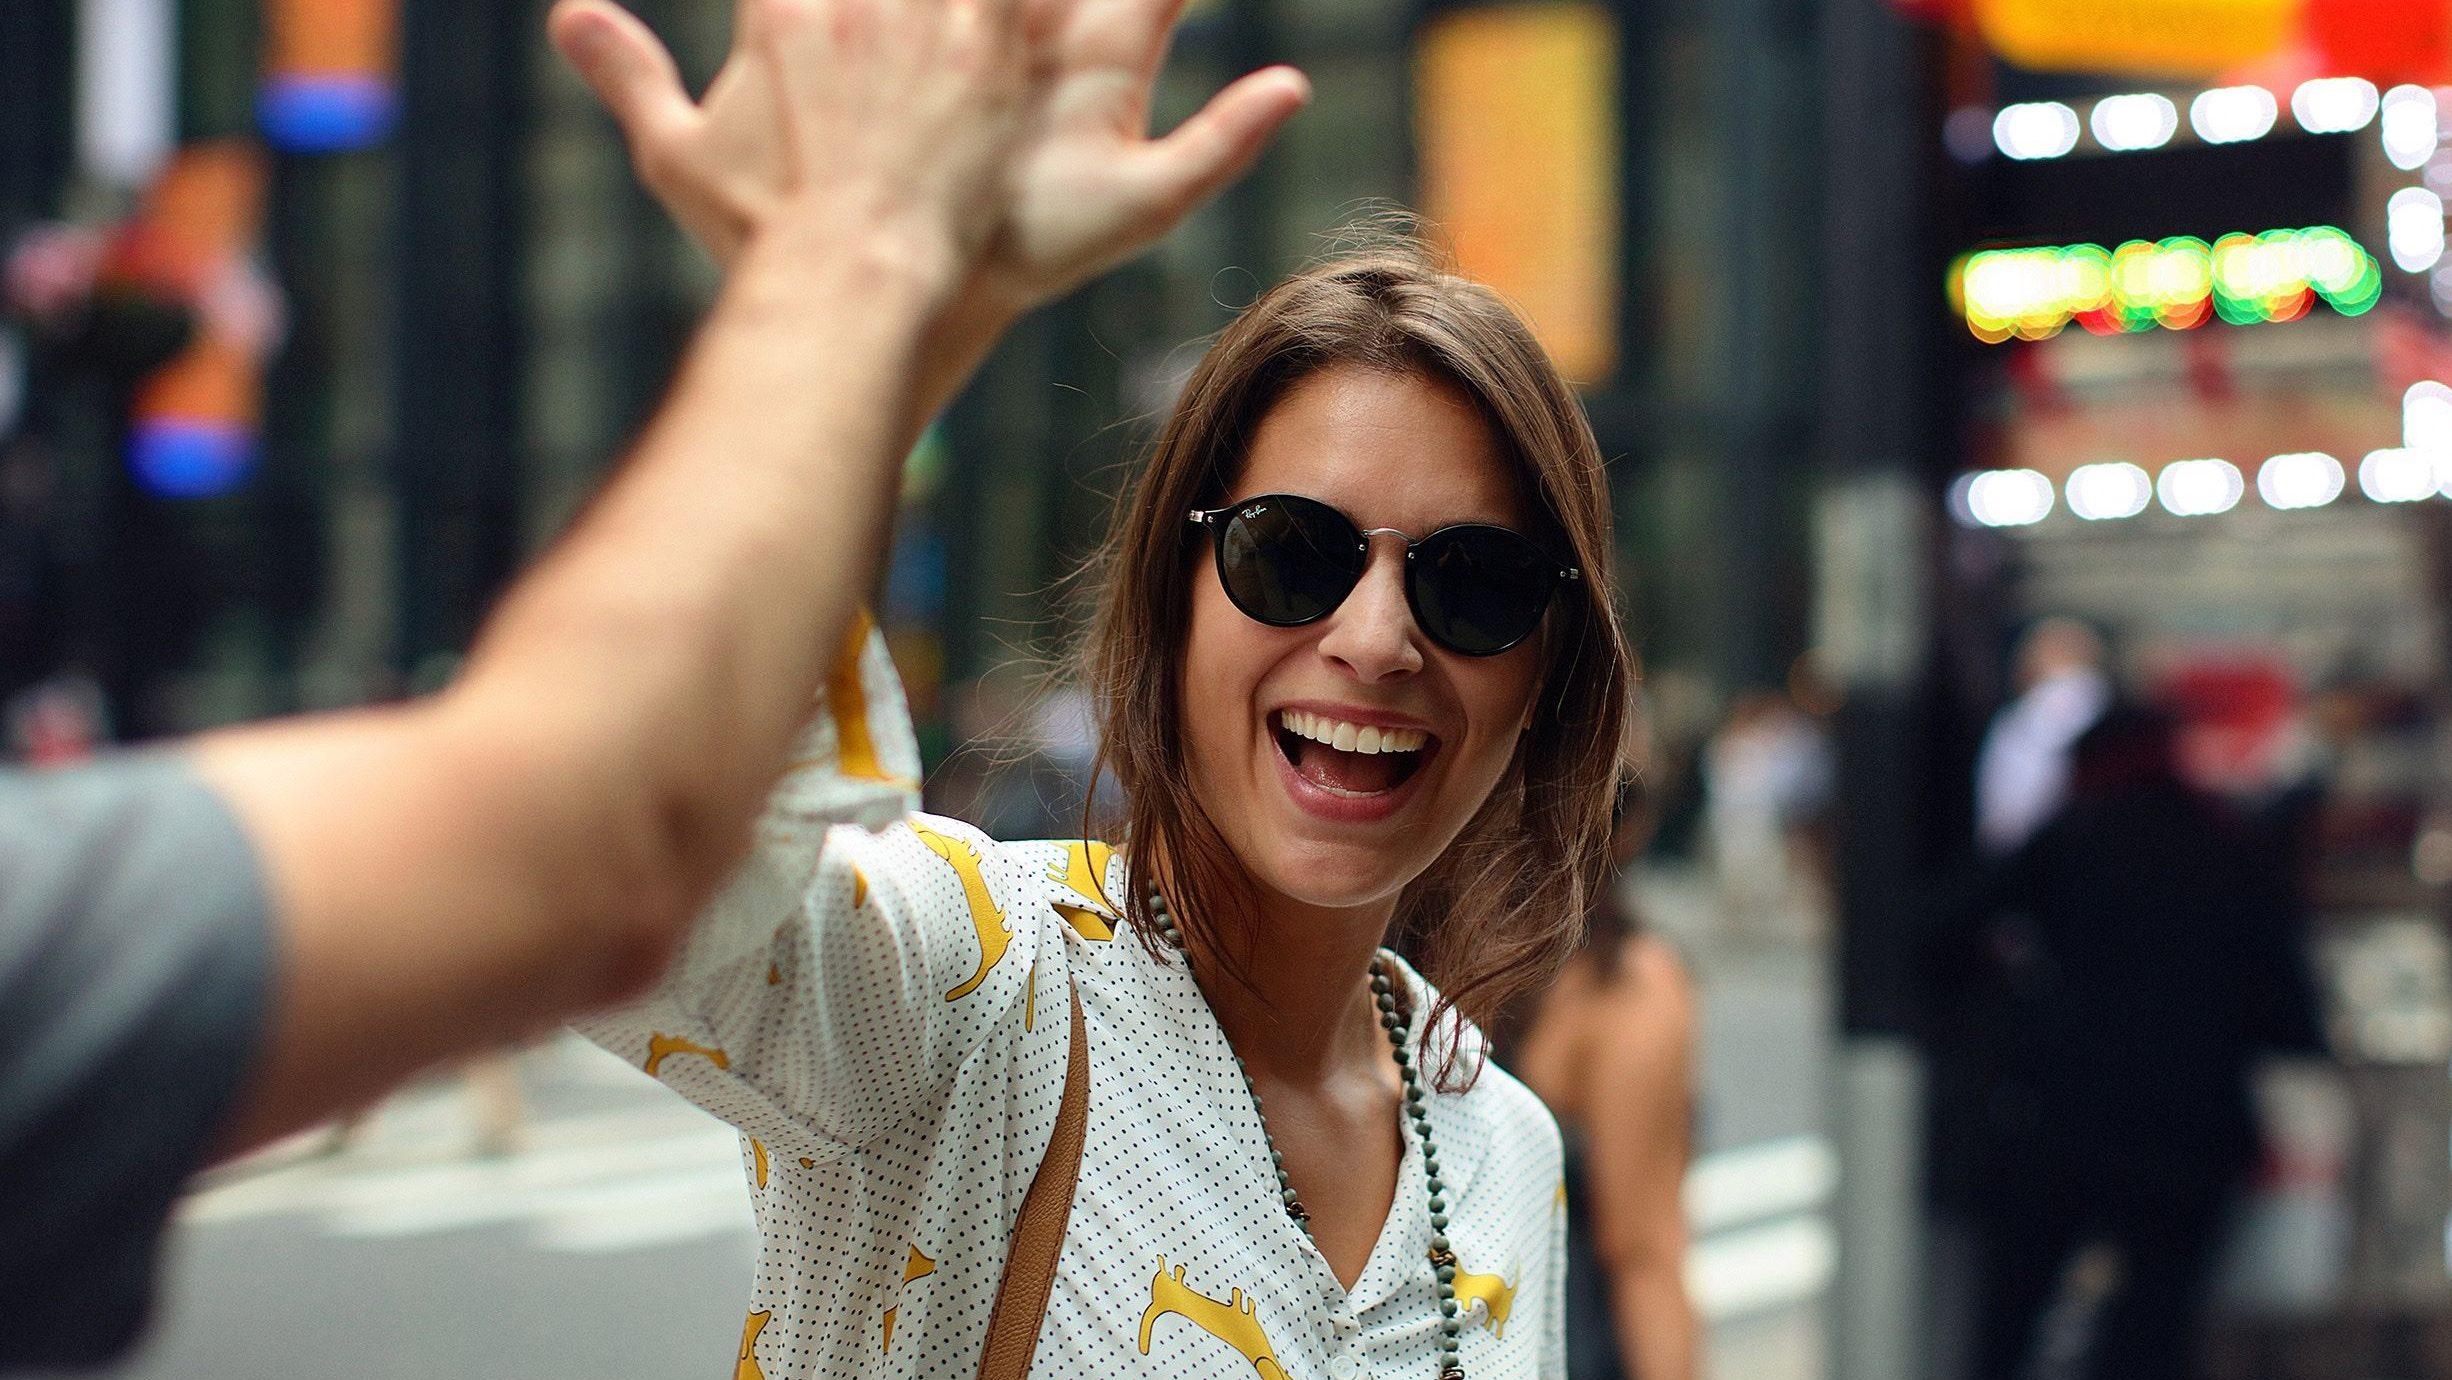 A smiling woman high fives a man